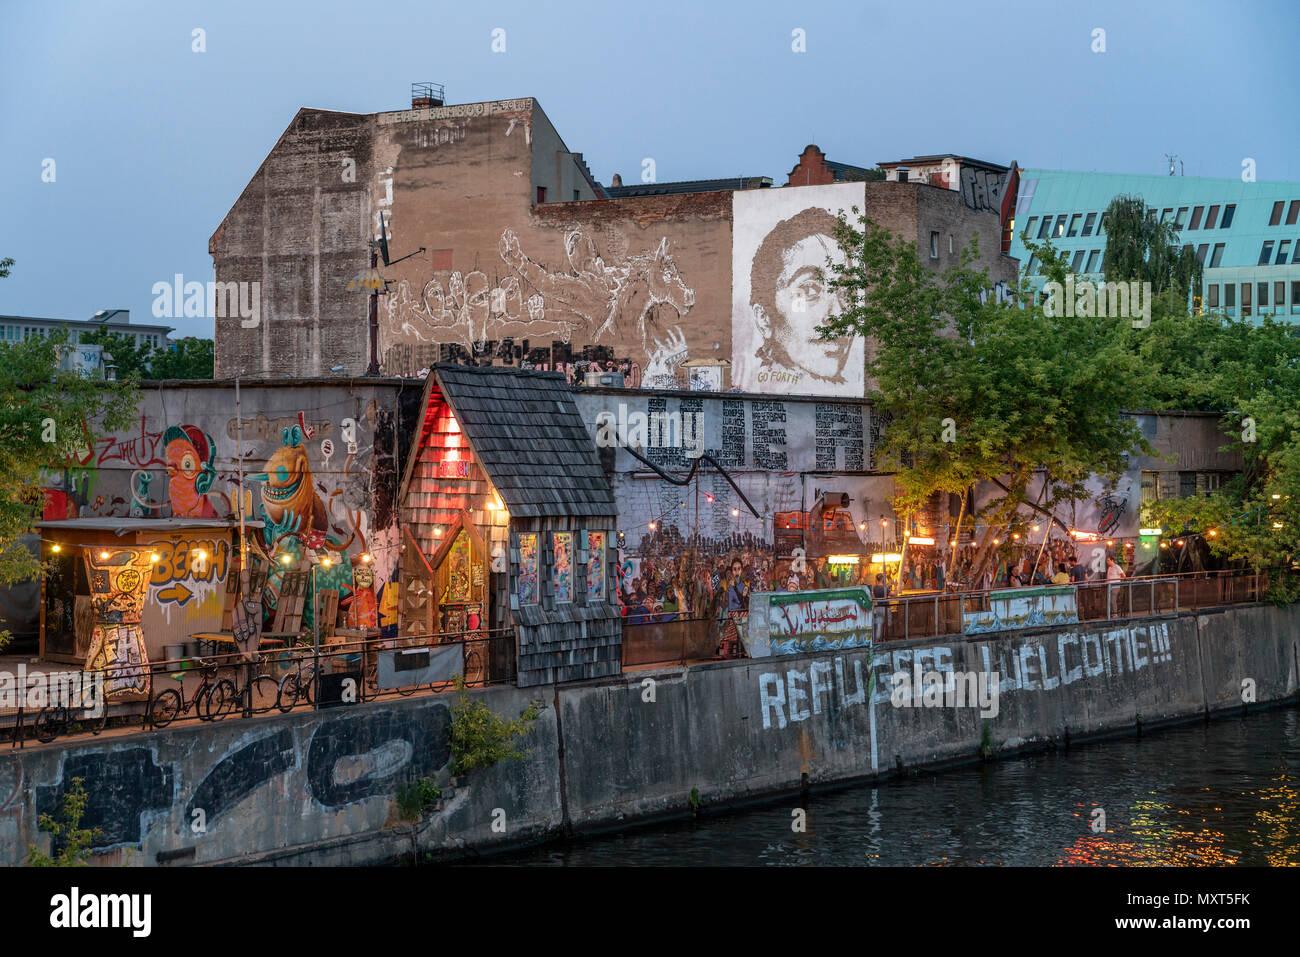 Yaam club at river Spree, Friedrichshain, Berlin, Germany - Stock Image